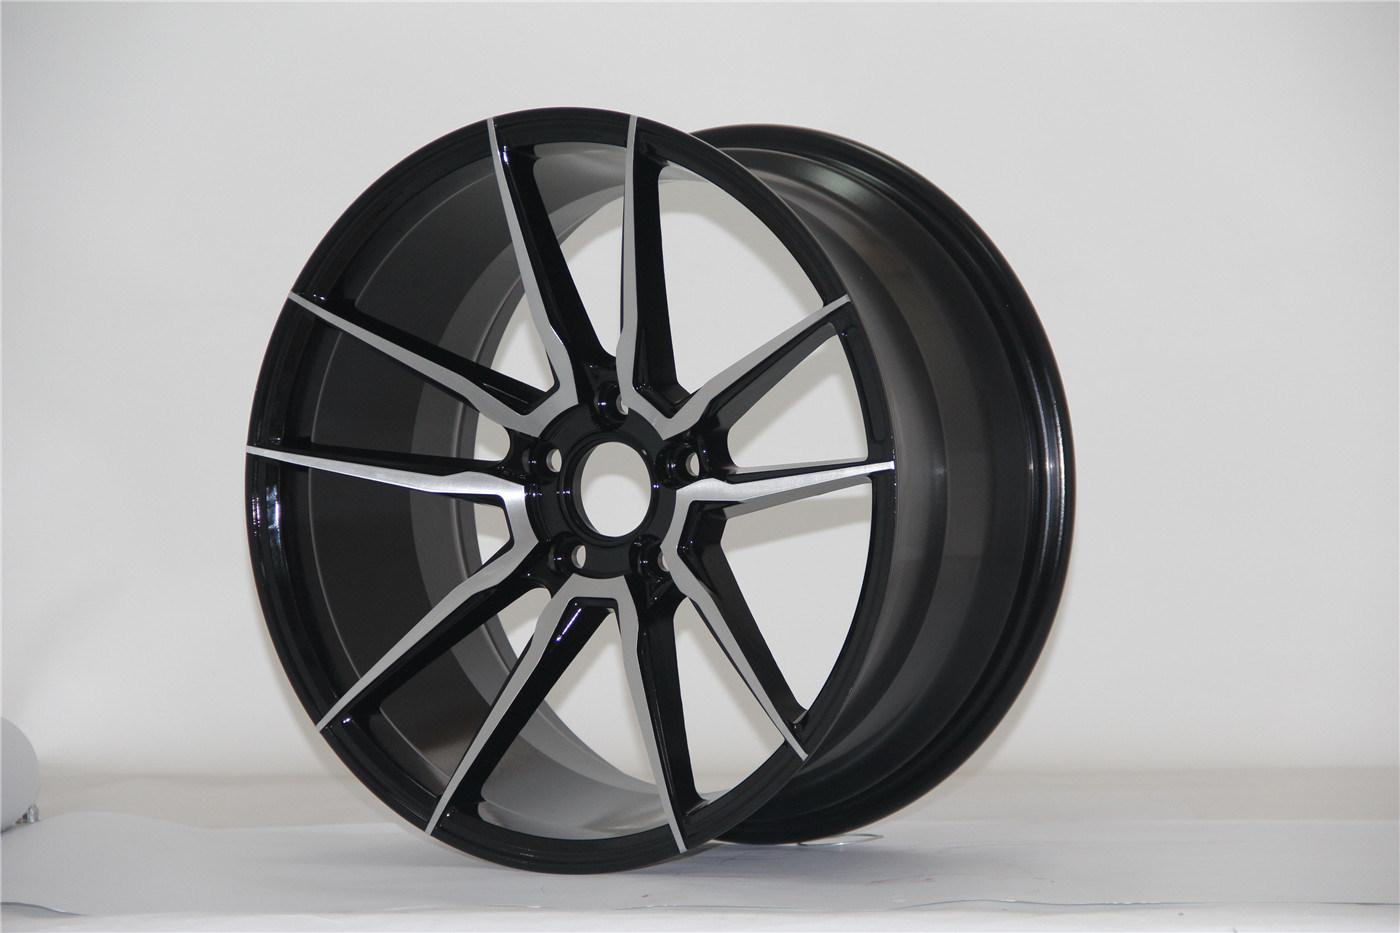 18X818X9 Car Alloy Wheels Aluminum Wheels Alloy Rims Auto Aprts Racing Wheels Aftermarket Wheels